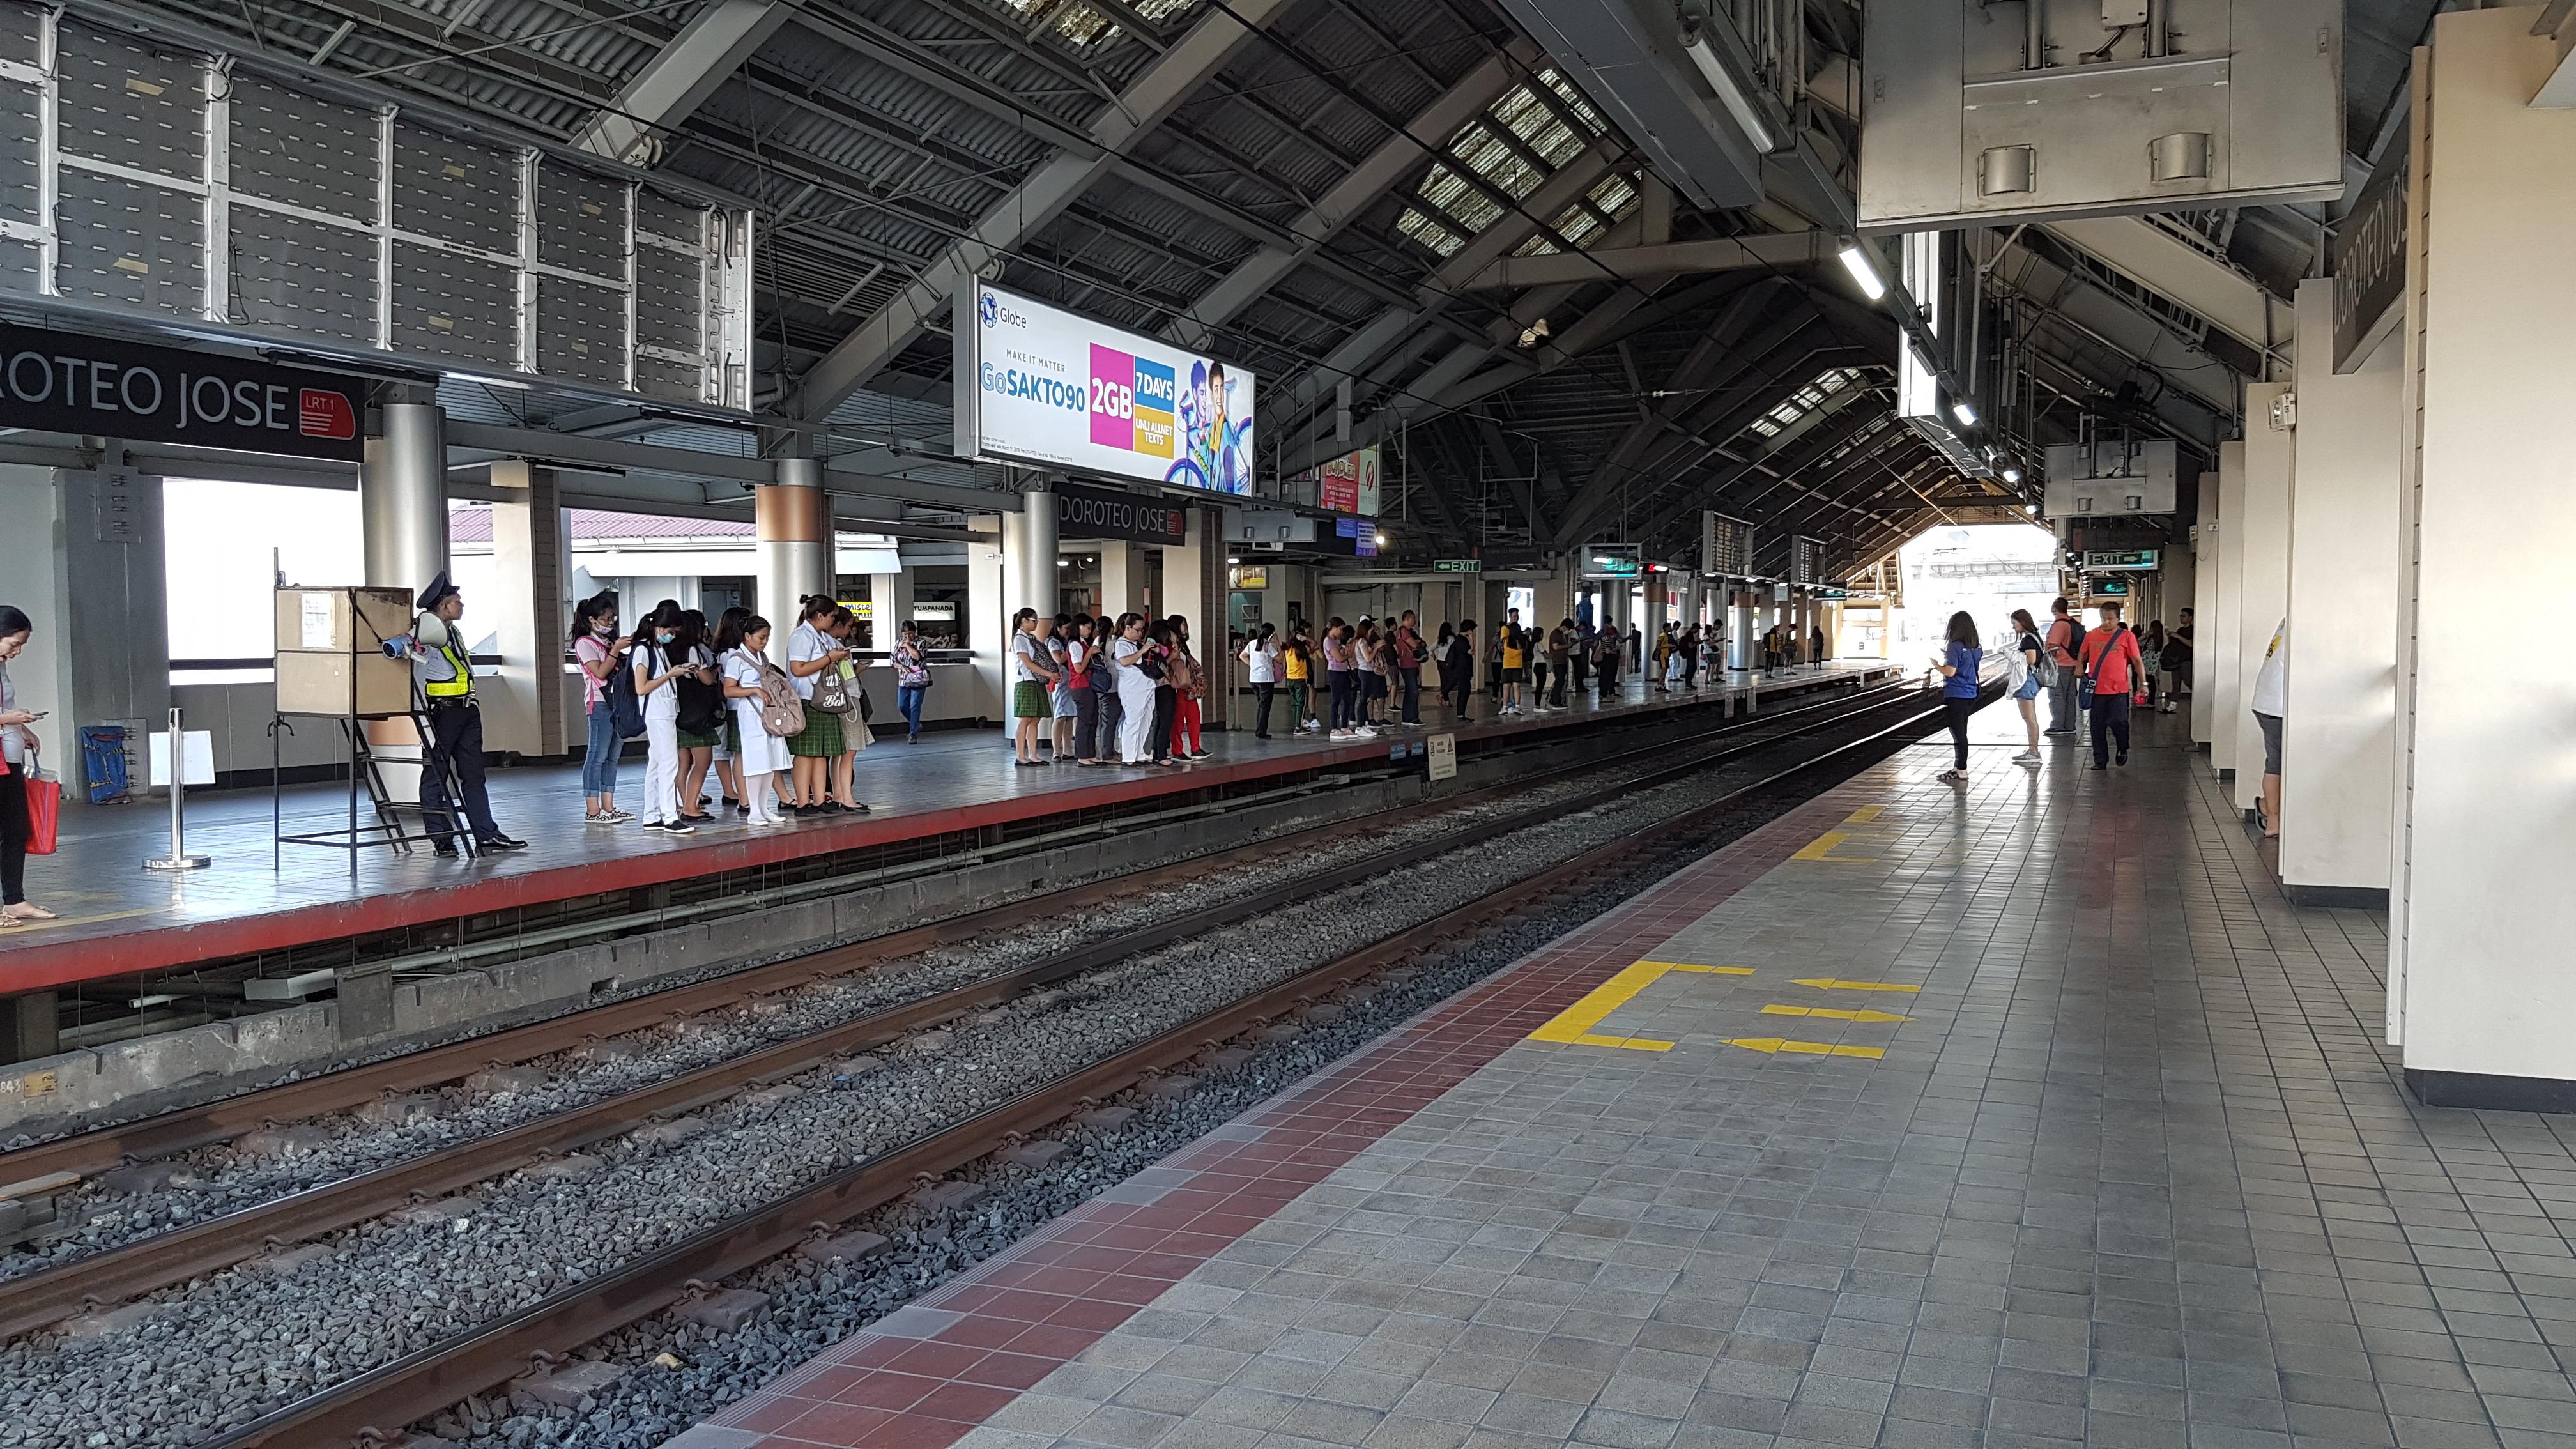 Doroteo Jose station - Wikipedia